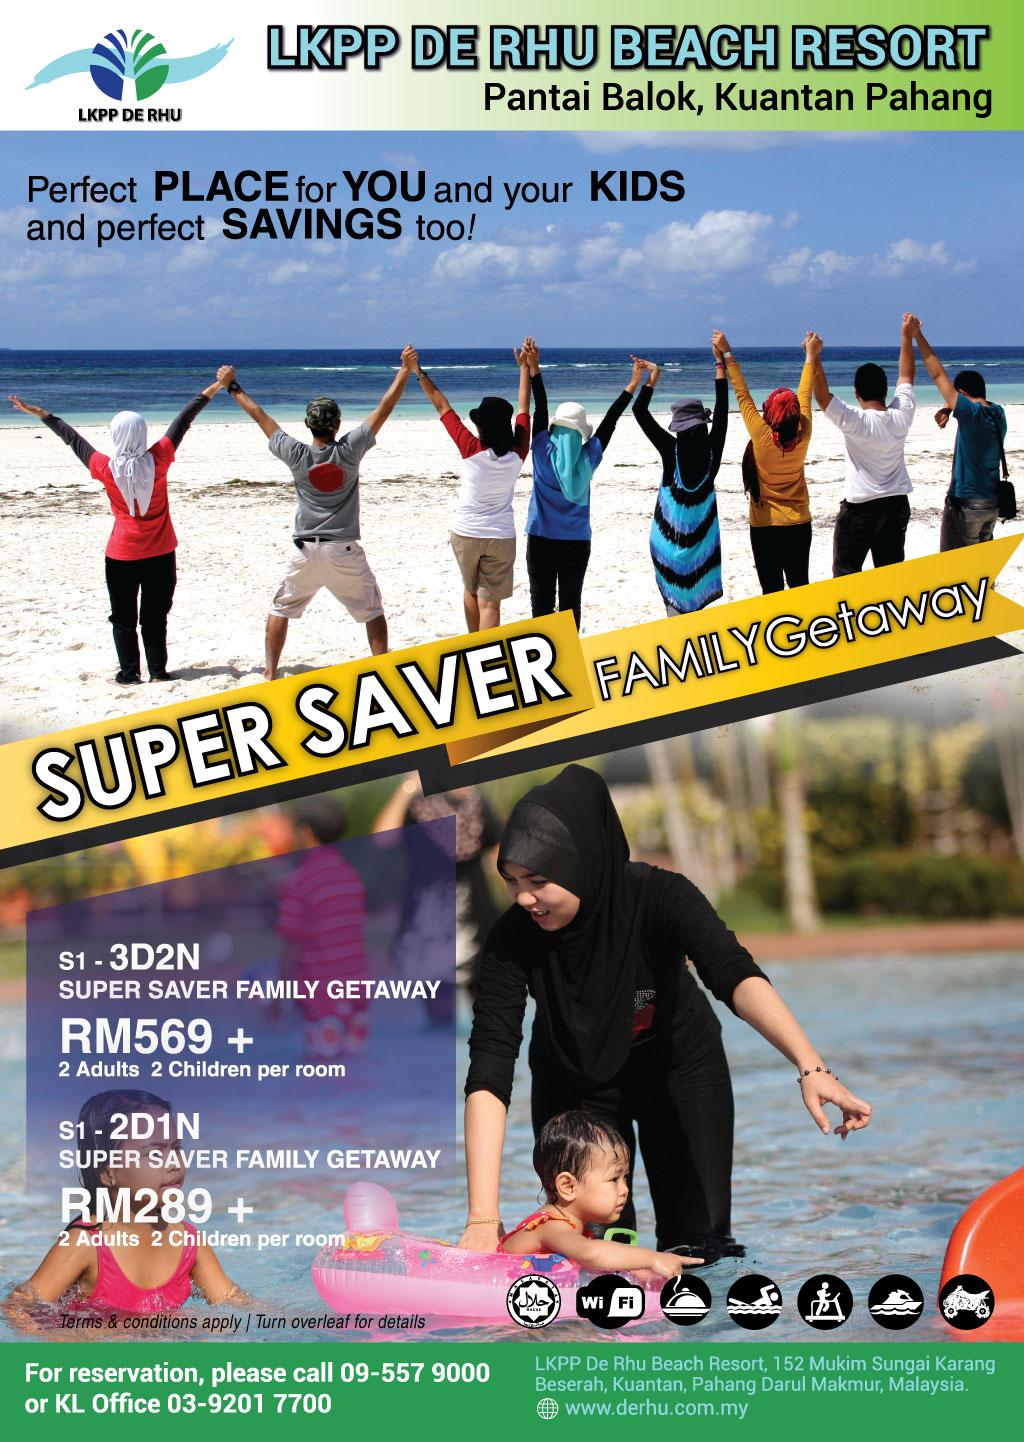 De-Rhu-Beach-Resort-Super-Saver-Package-2016